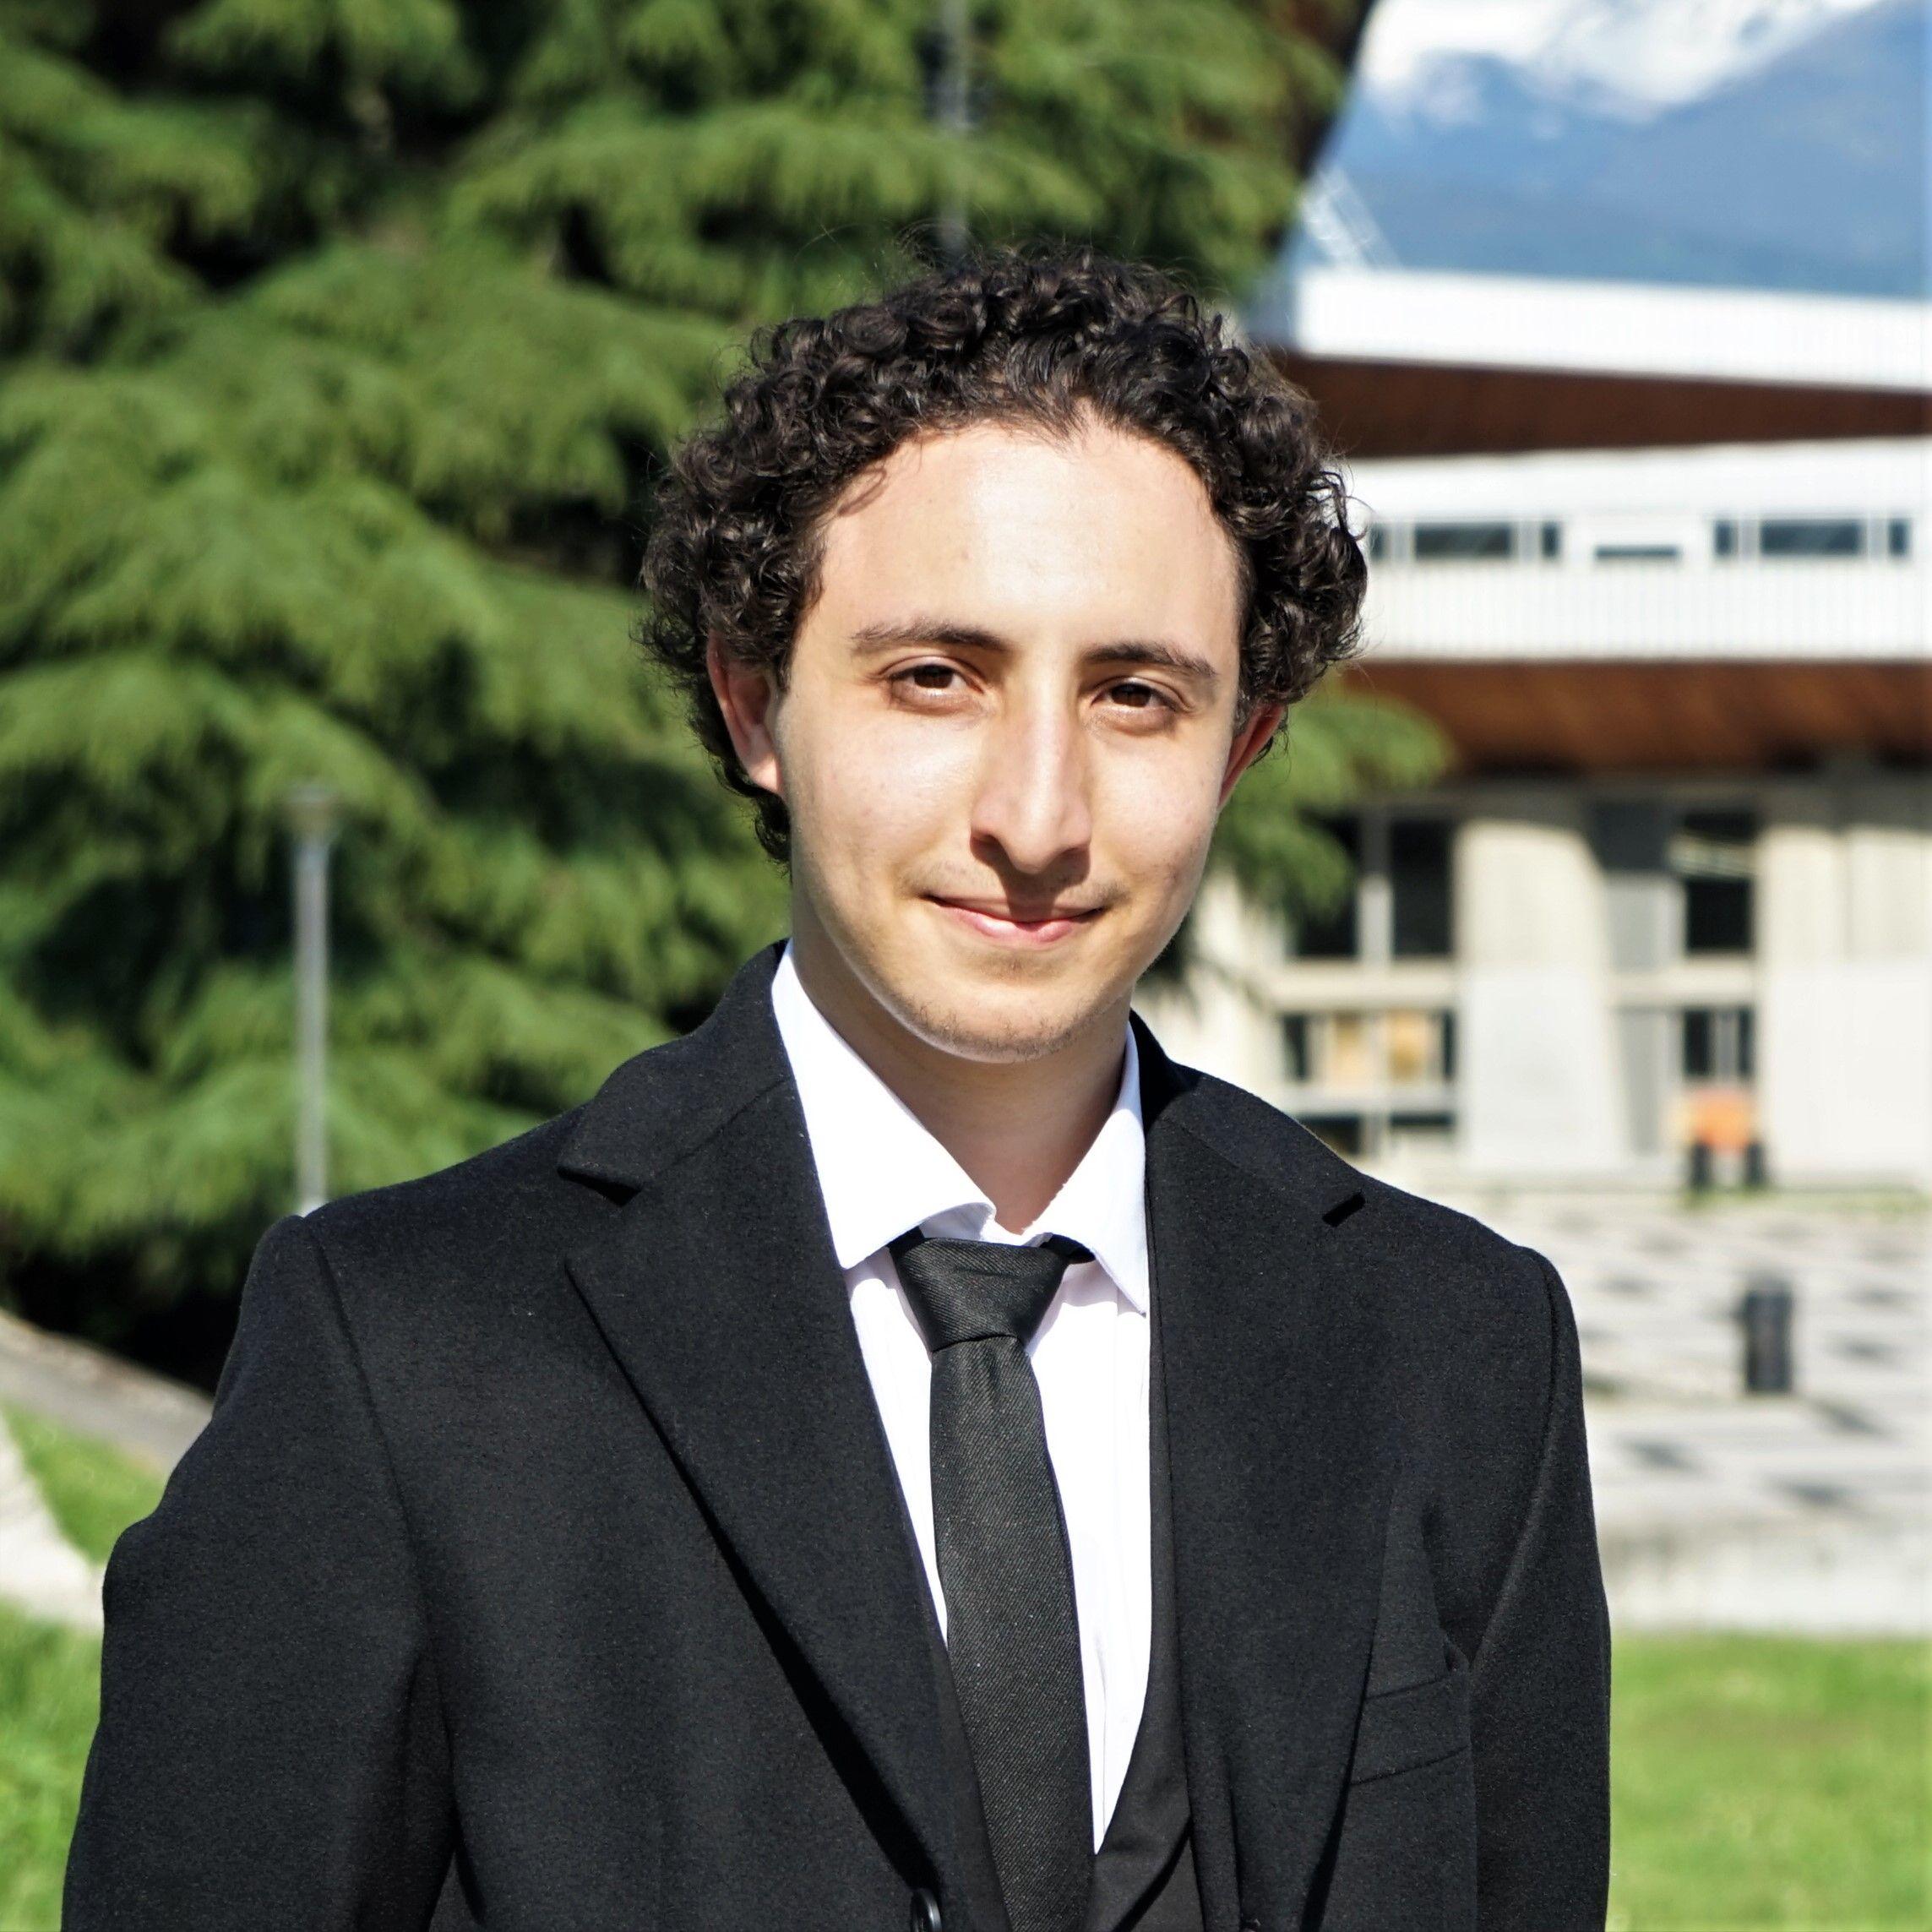 Ayoub Miguil